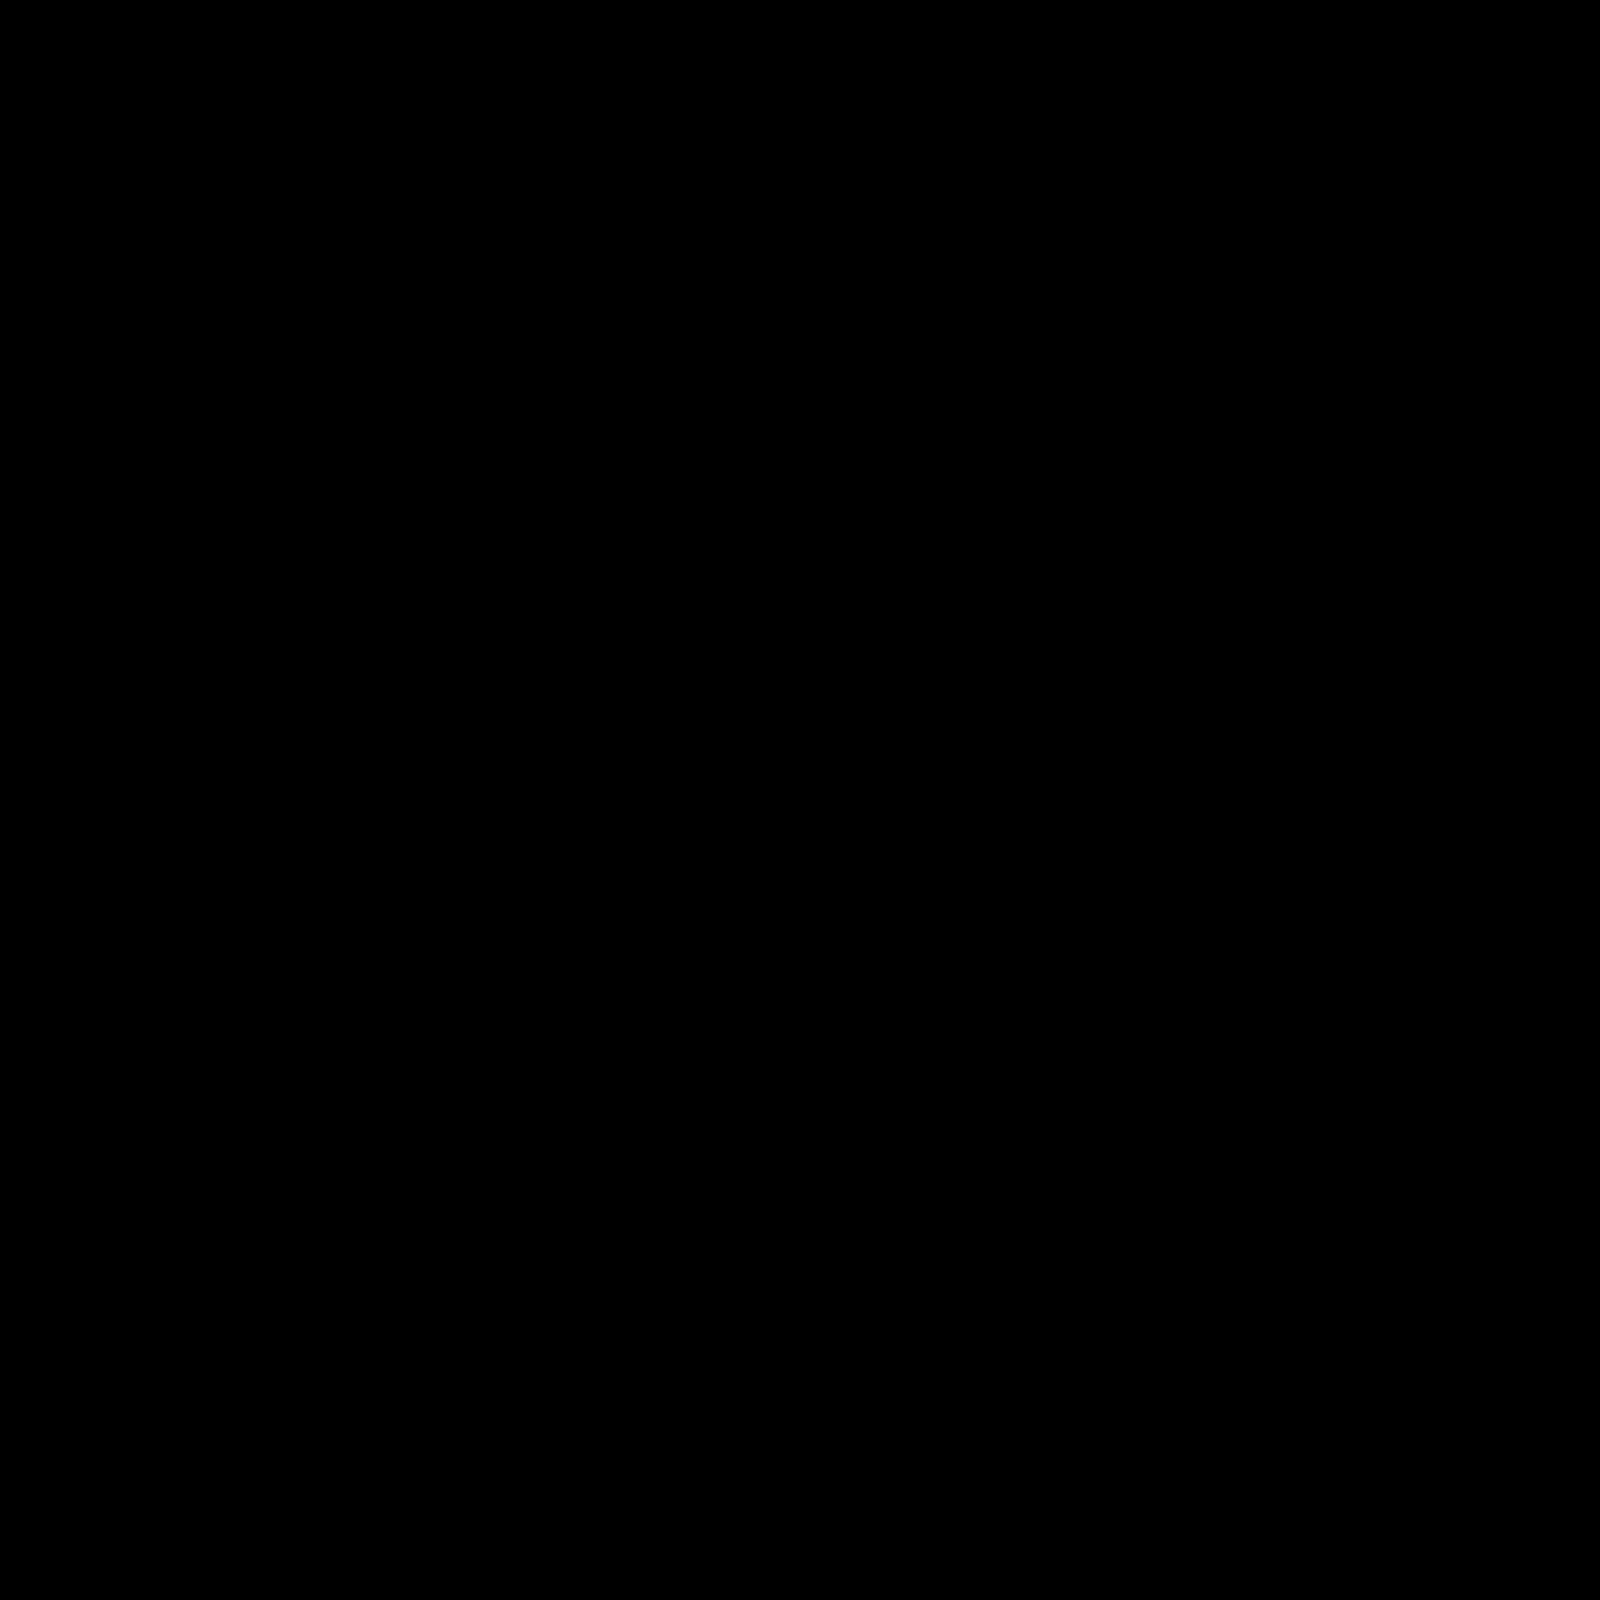 Myspace Quadrat umrandet icon